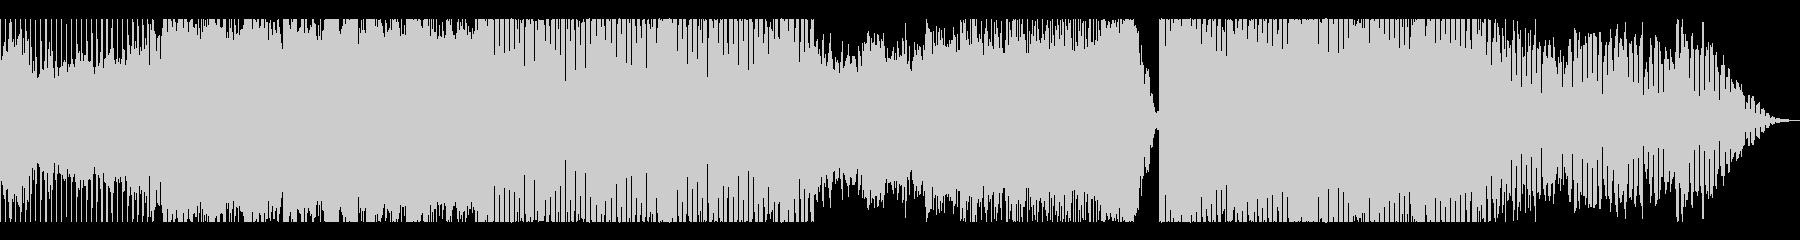 Future Bass×エレキ EDM の未再生の波形